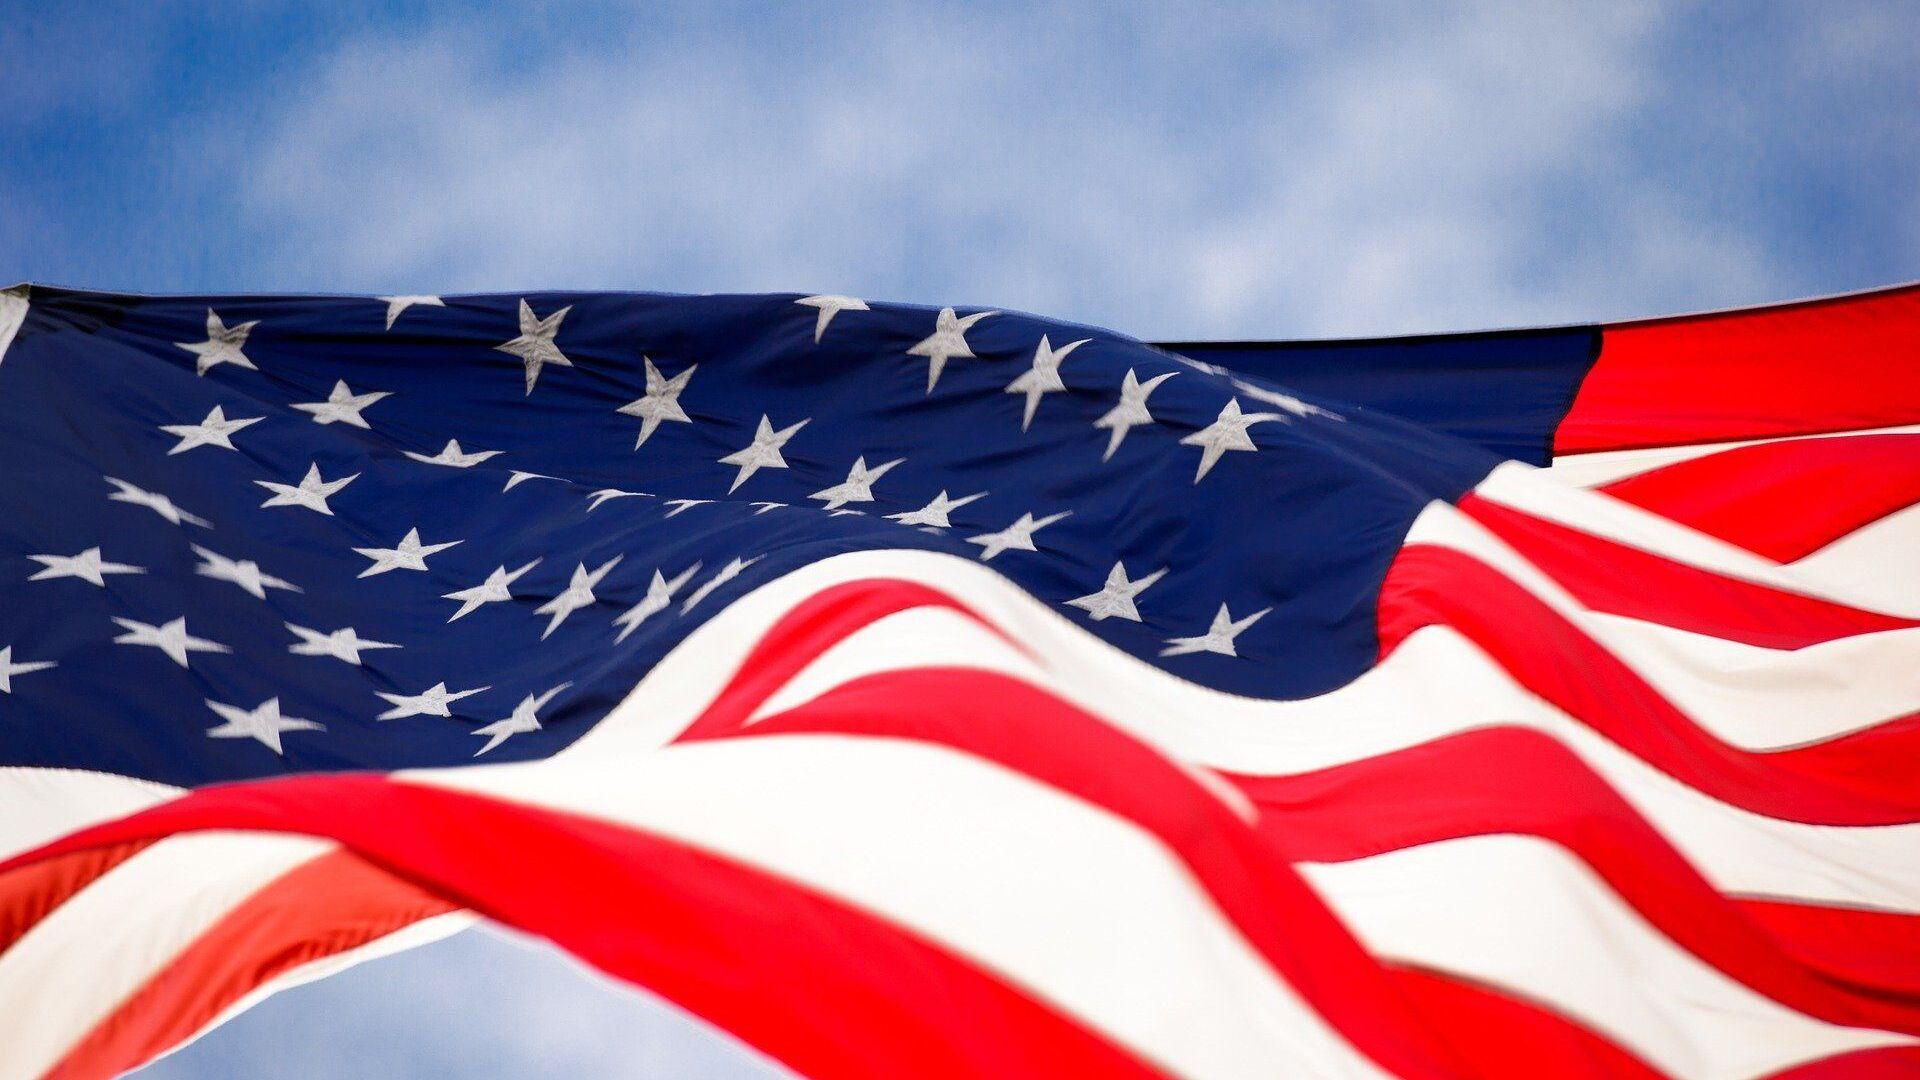 Bandera de EEUU - Sputnik Mundo, 1920, 13.08.2021